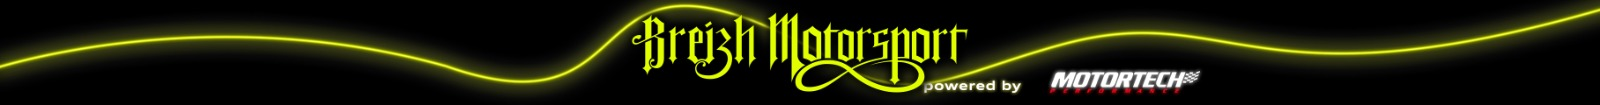 BreizhMotorsport powered by Motortech